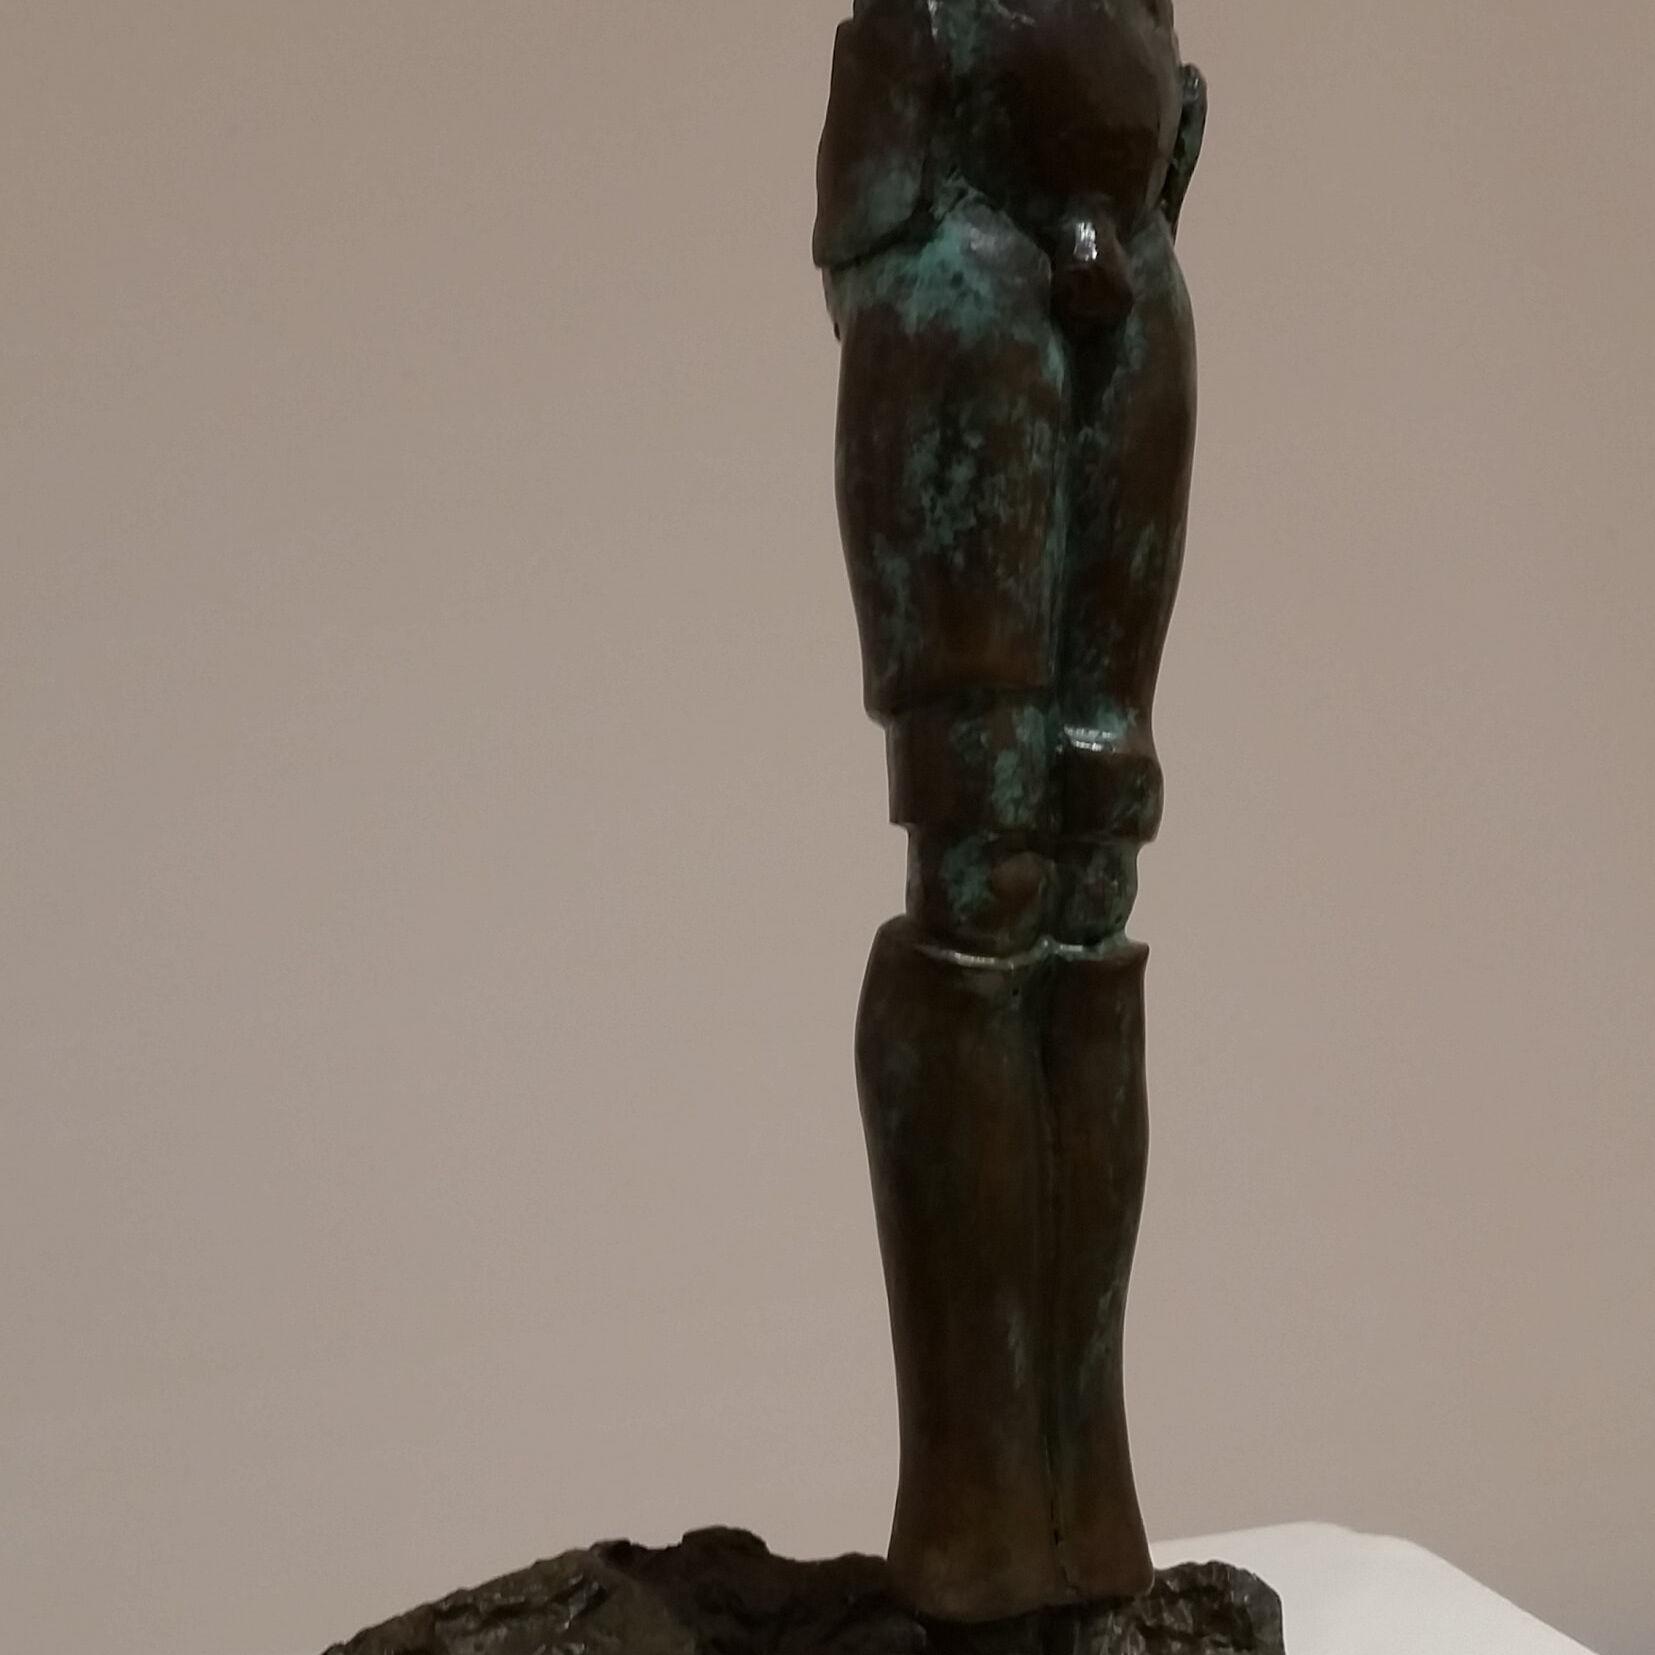 Claudine Top_It is just a dream_Sculpture Winner 2021